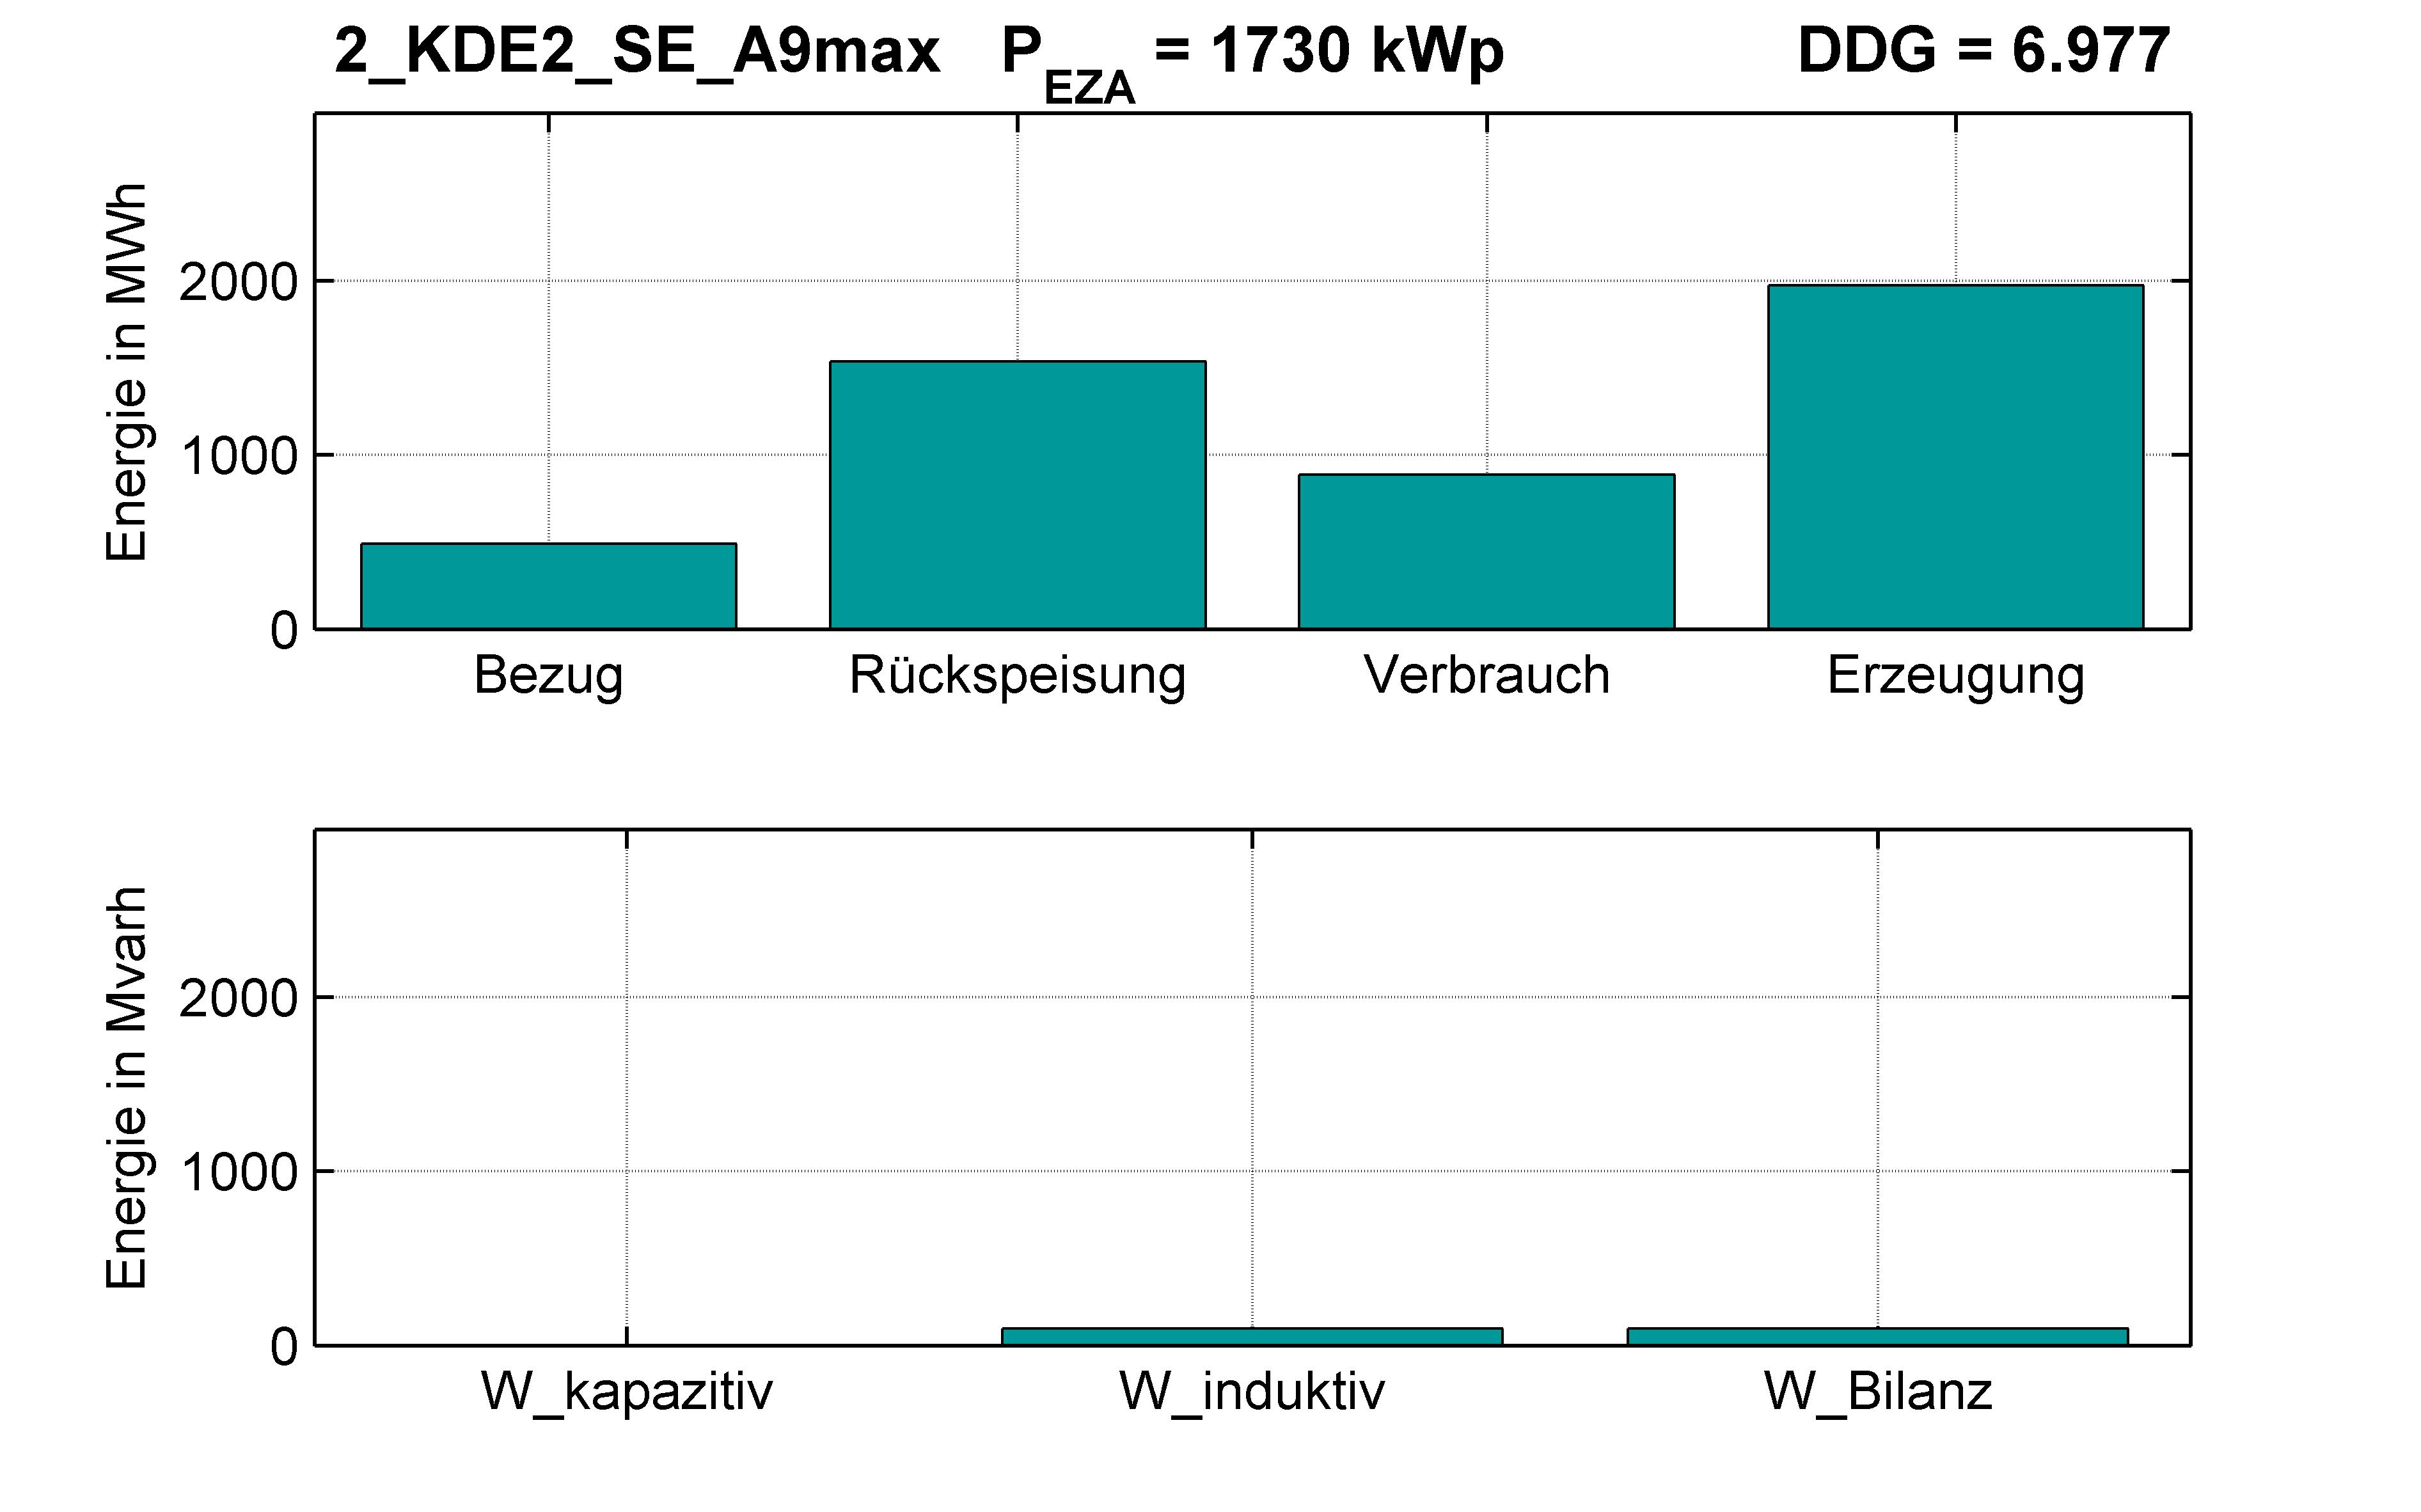 KDE2 | P-Kappung 85% (SE) A9max | PQ-Bilanz